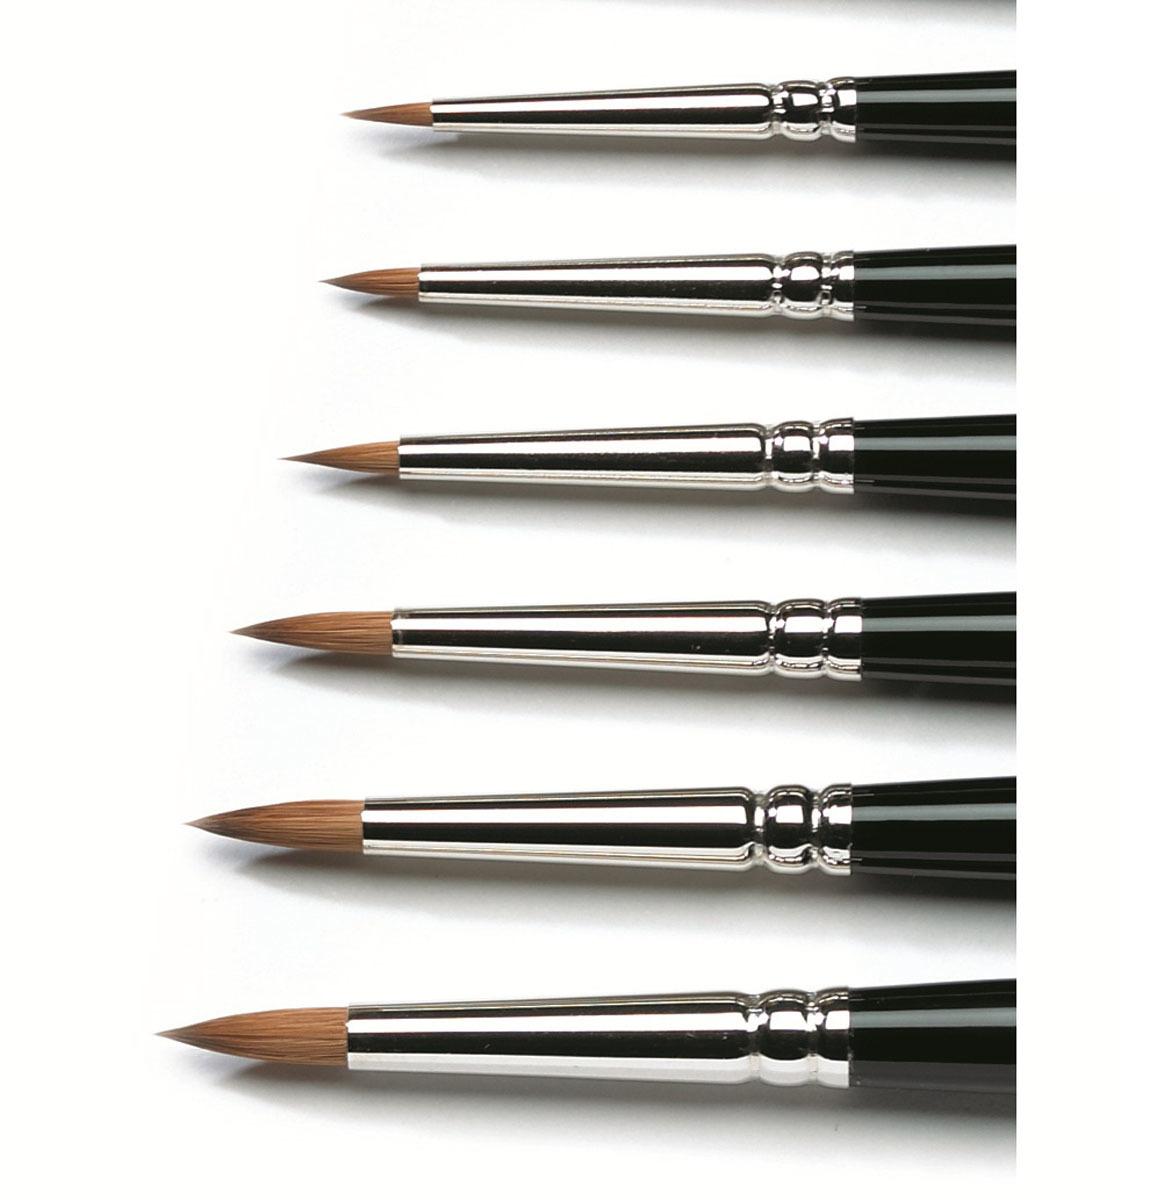 Winsor & Newton: Brush Series 7 Sable Miniature #000 image